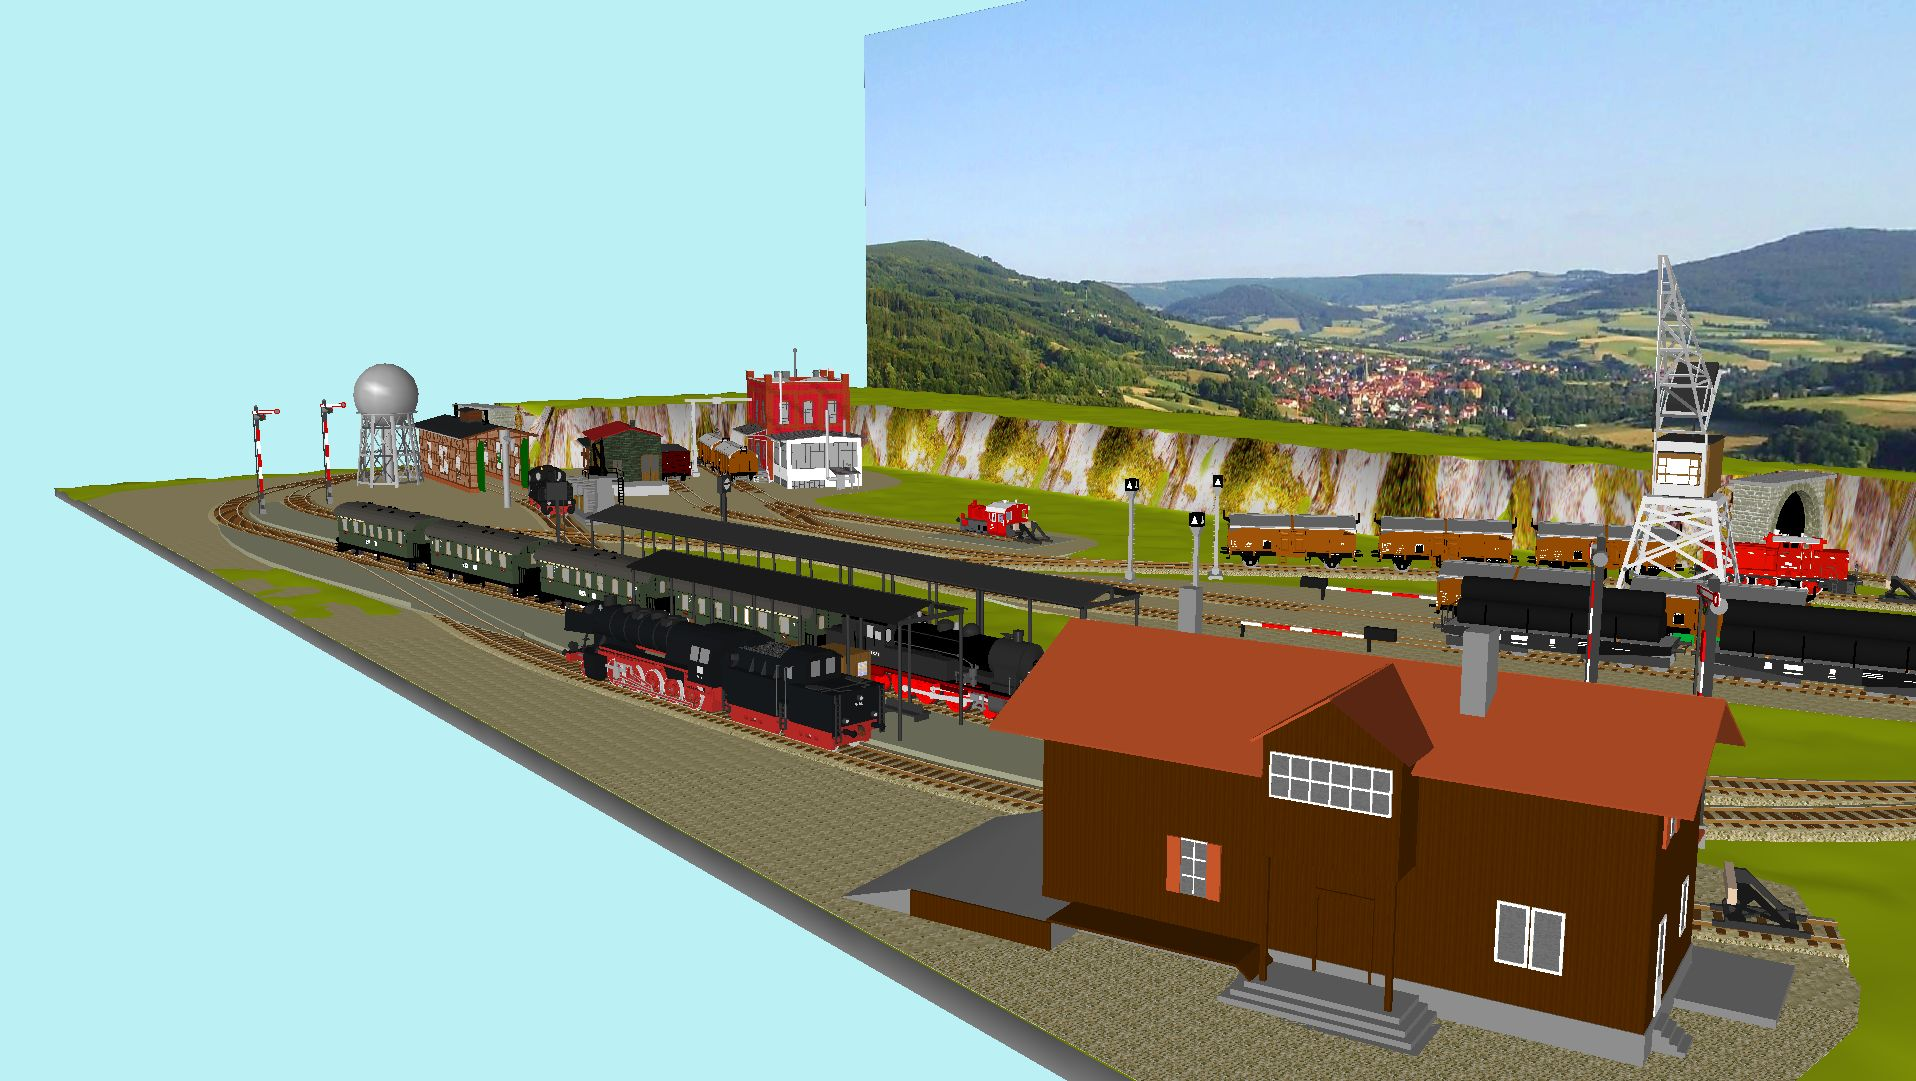 'ALBA Modellbahnpraxis' Band 1, Plan 5 Amp-1_5_c-gleis_3bhki6